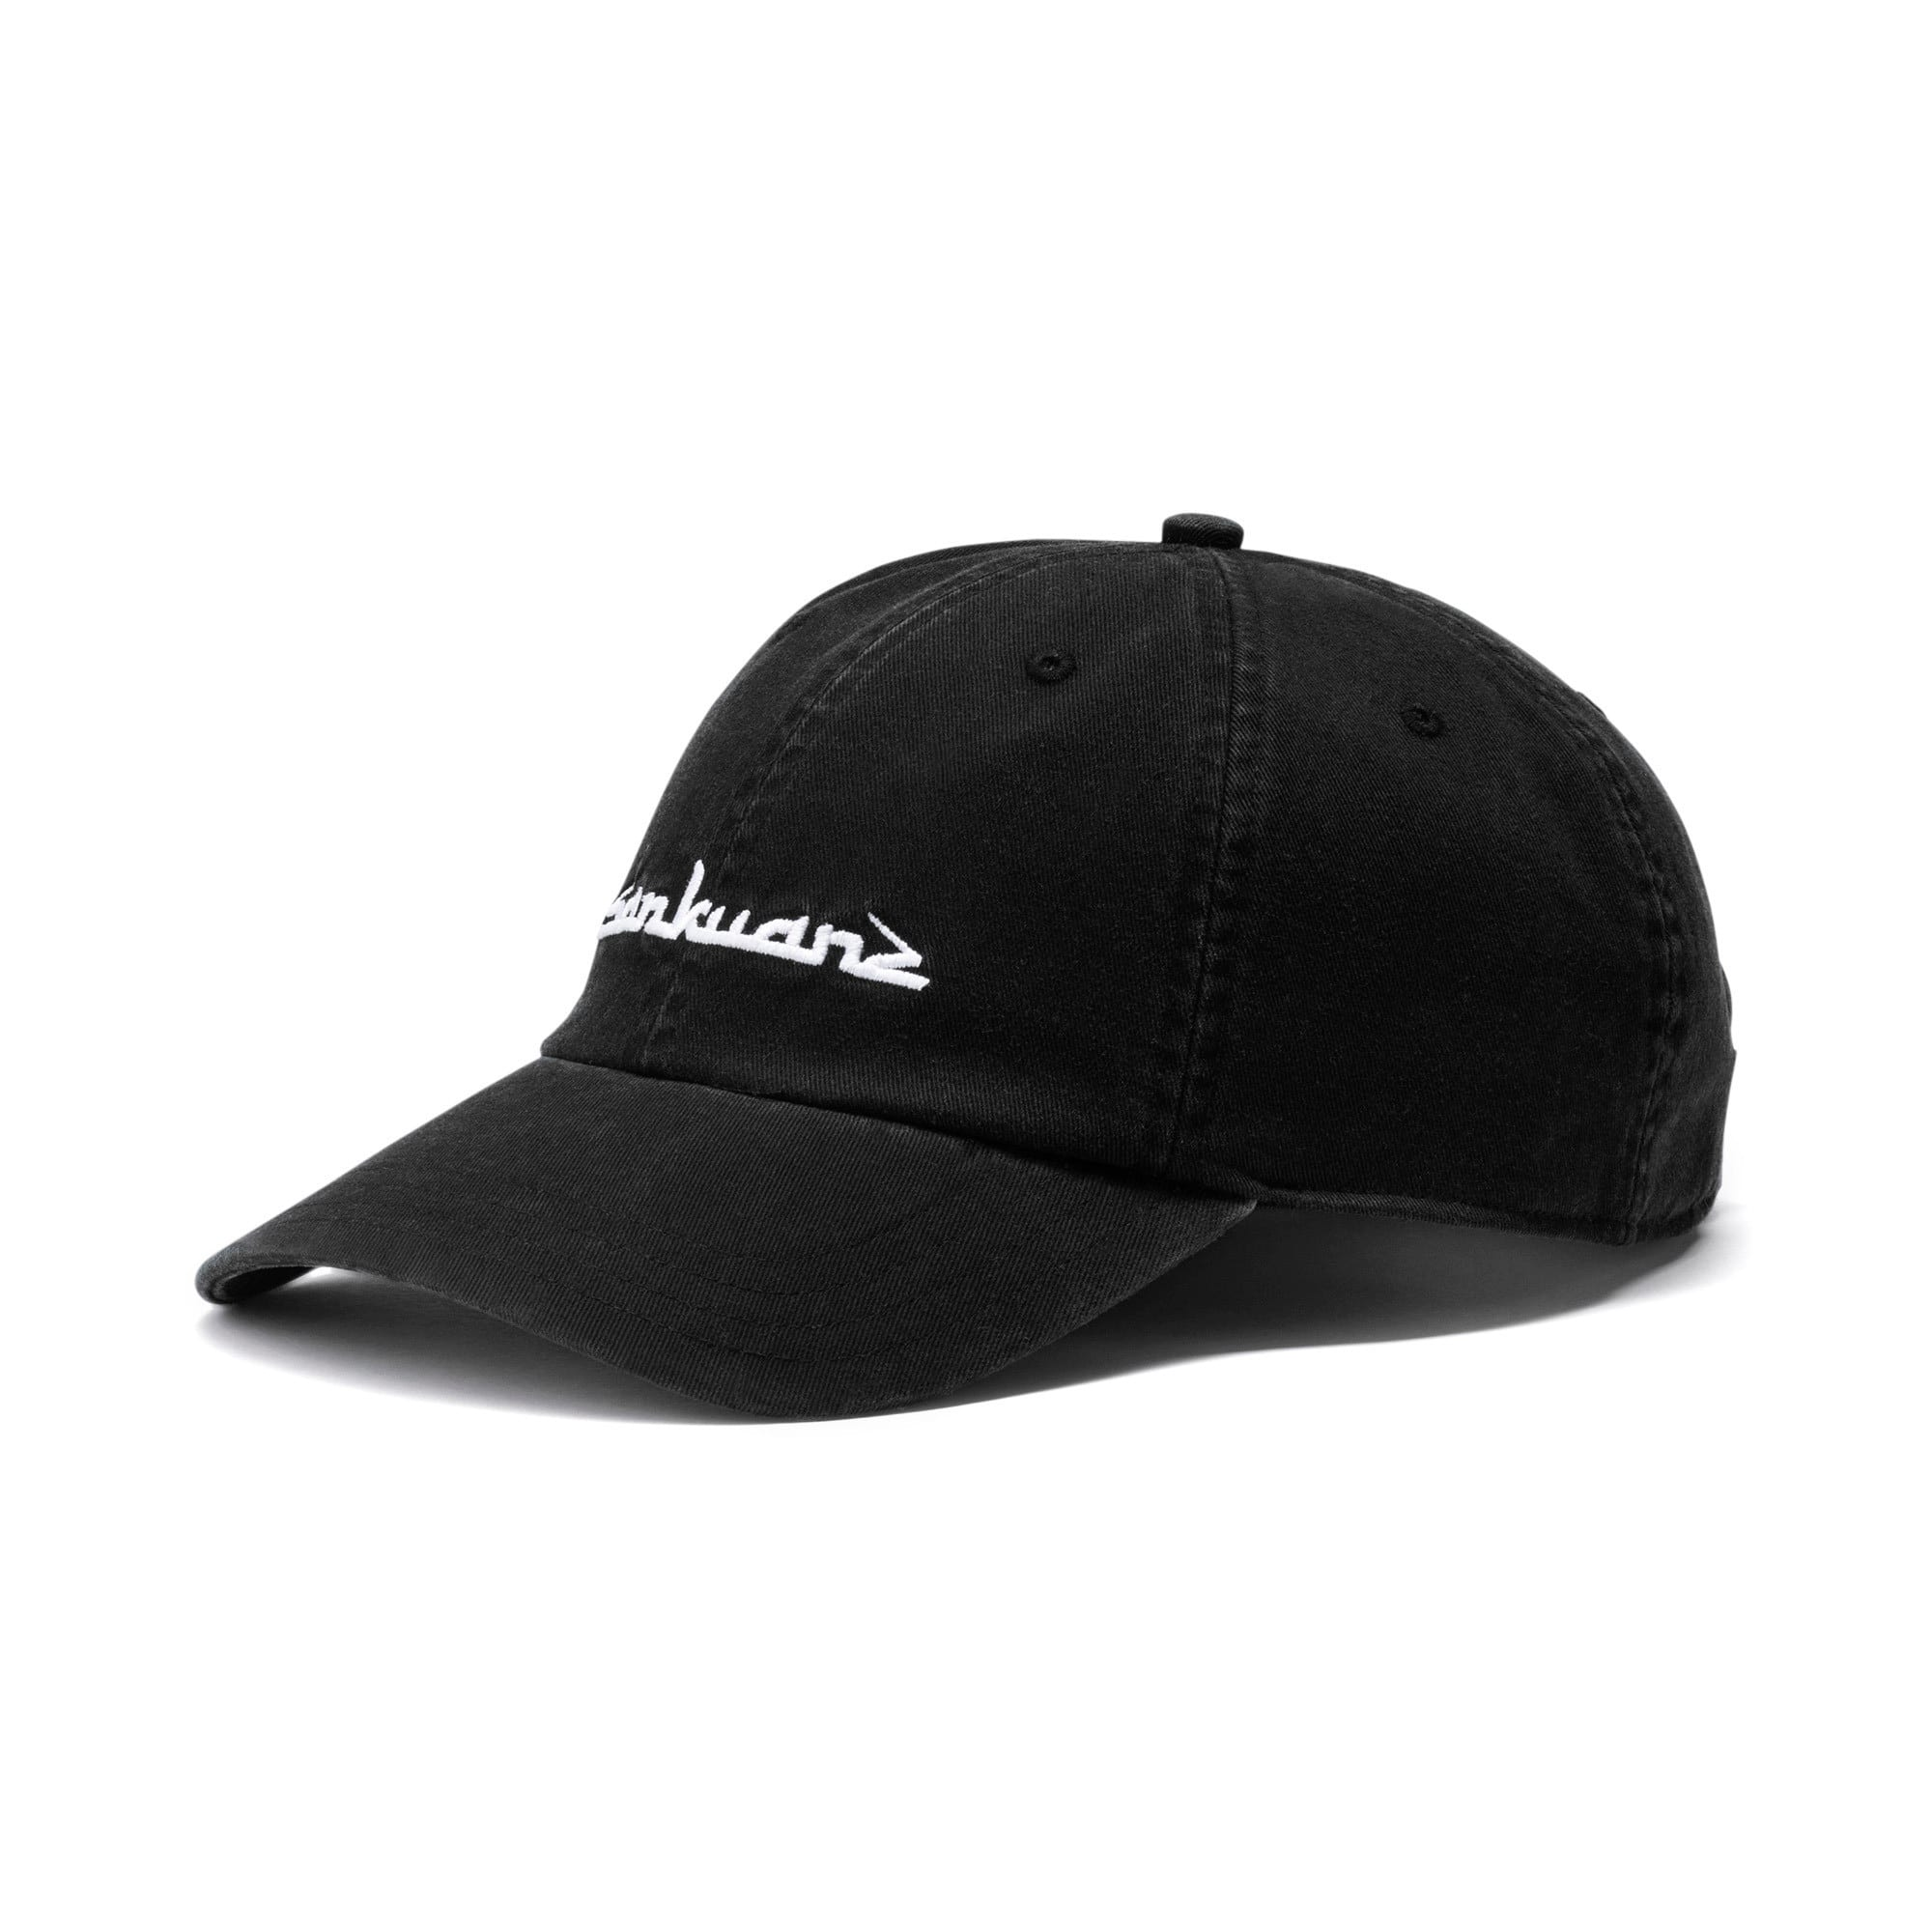 Thumbnail 1 of PUMA x SANKUANZ Baseball Cap, Puma Black, medium